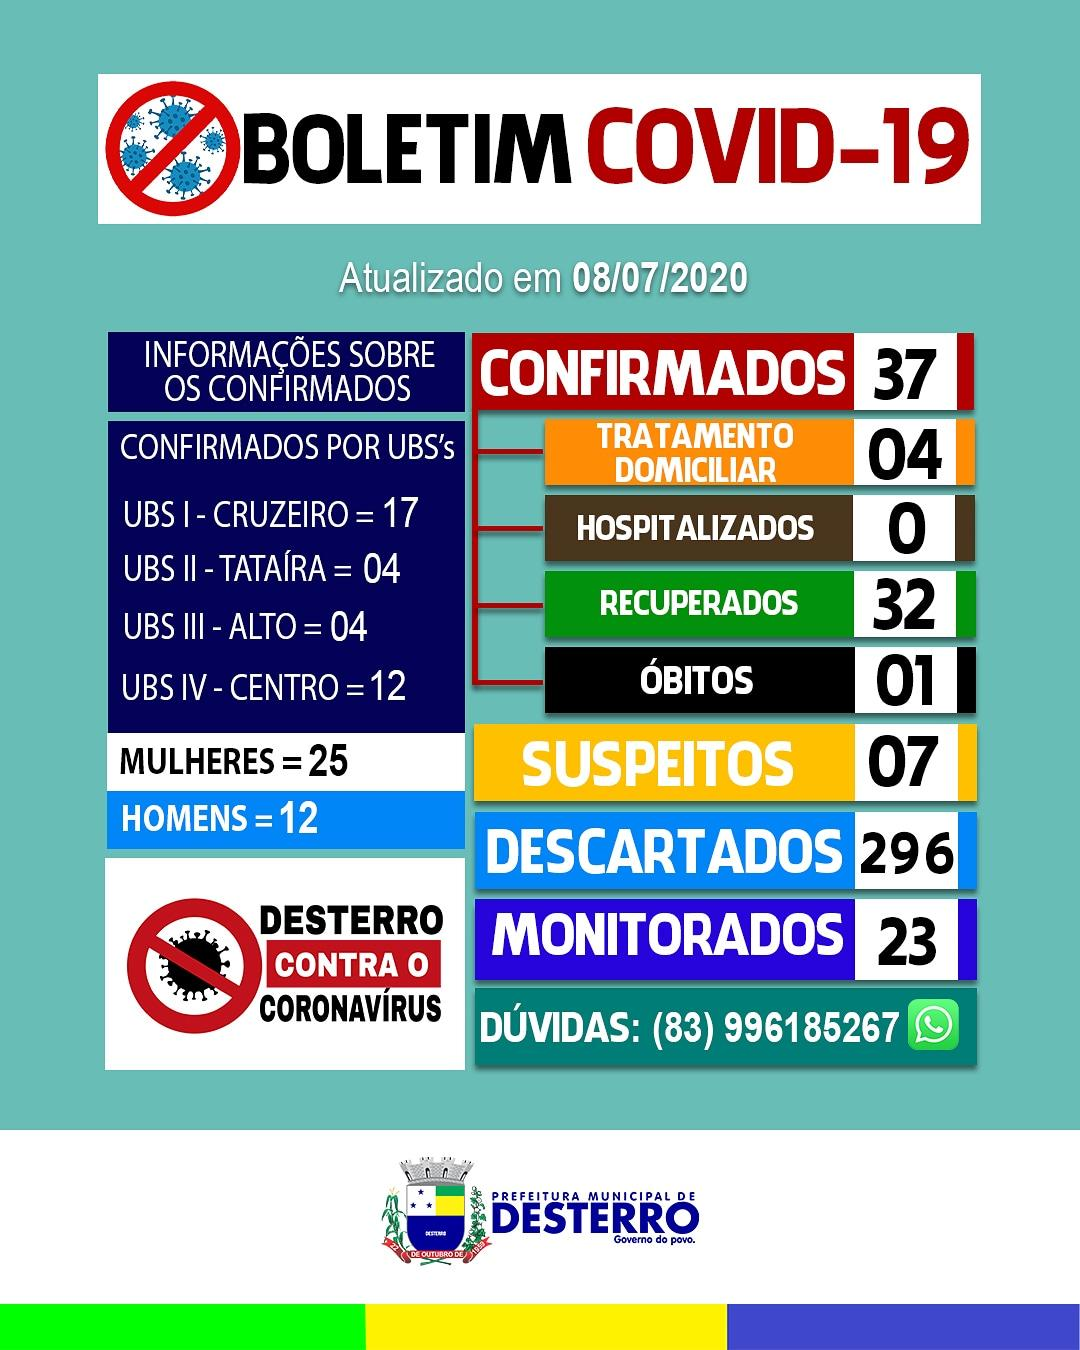 Boletim Covid-19 (08/07/2020)